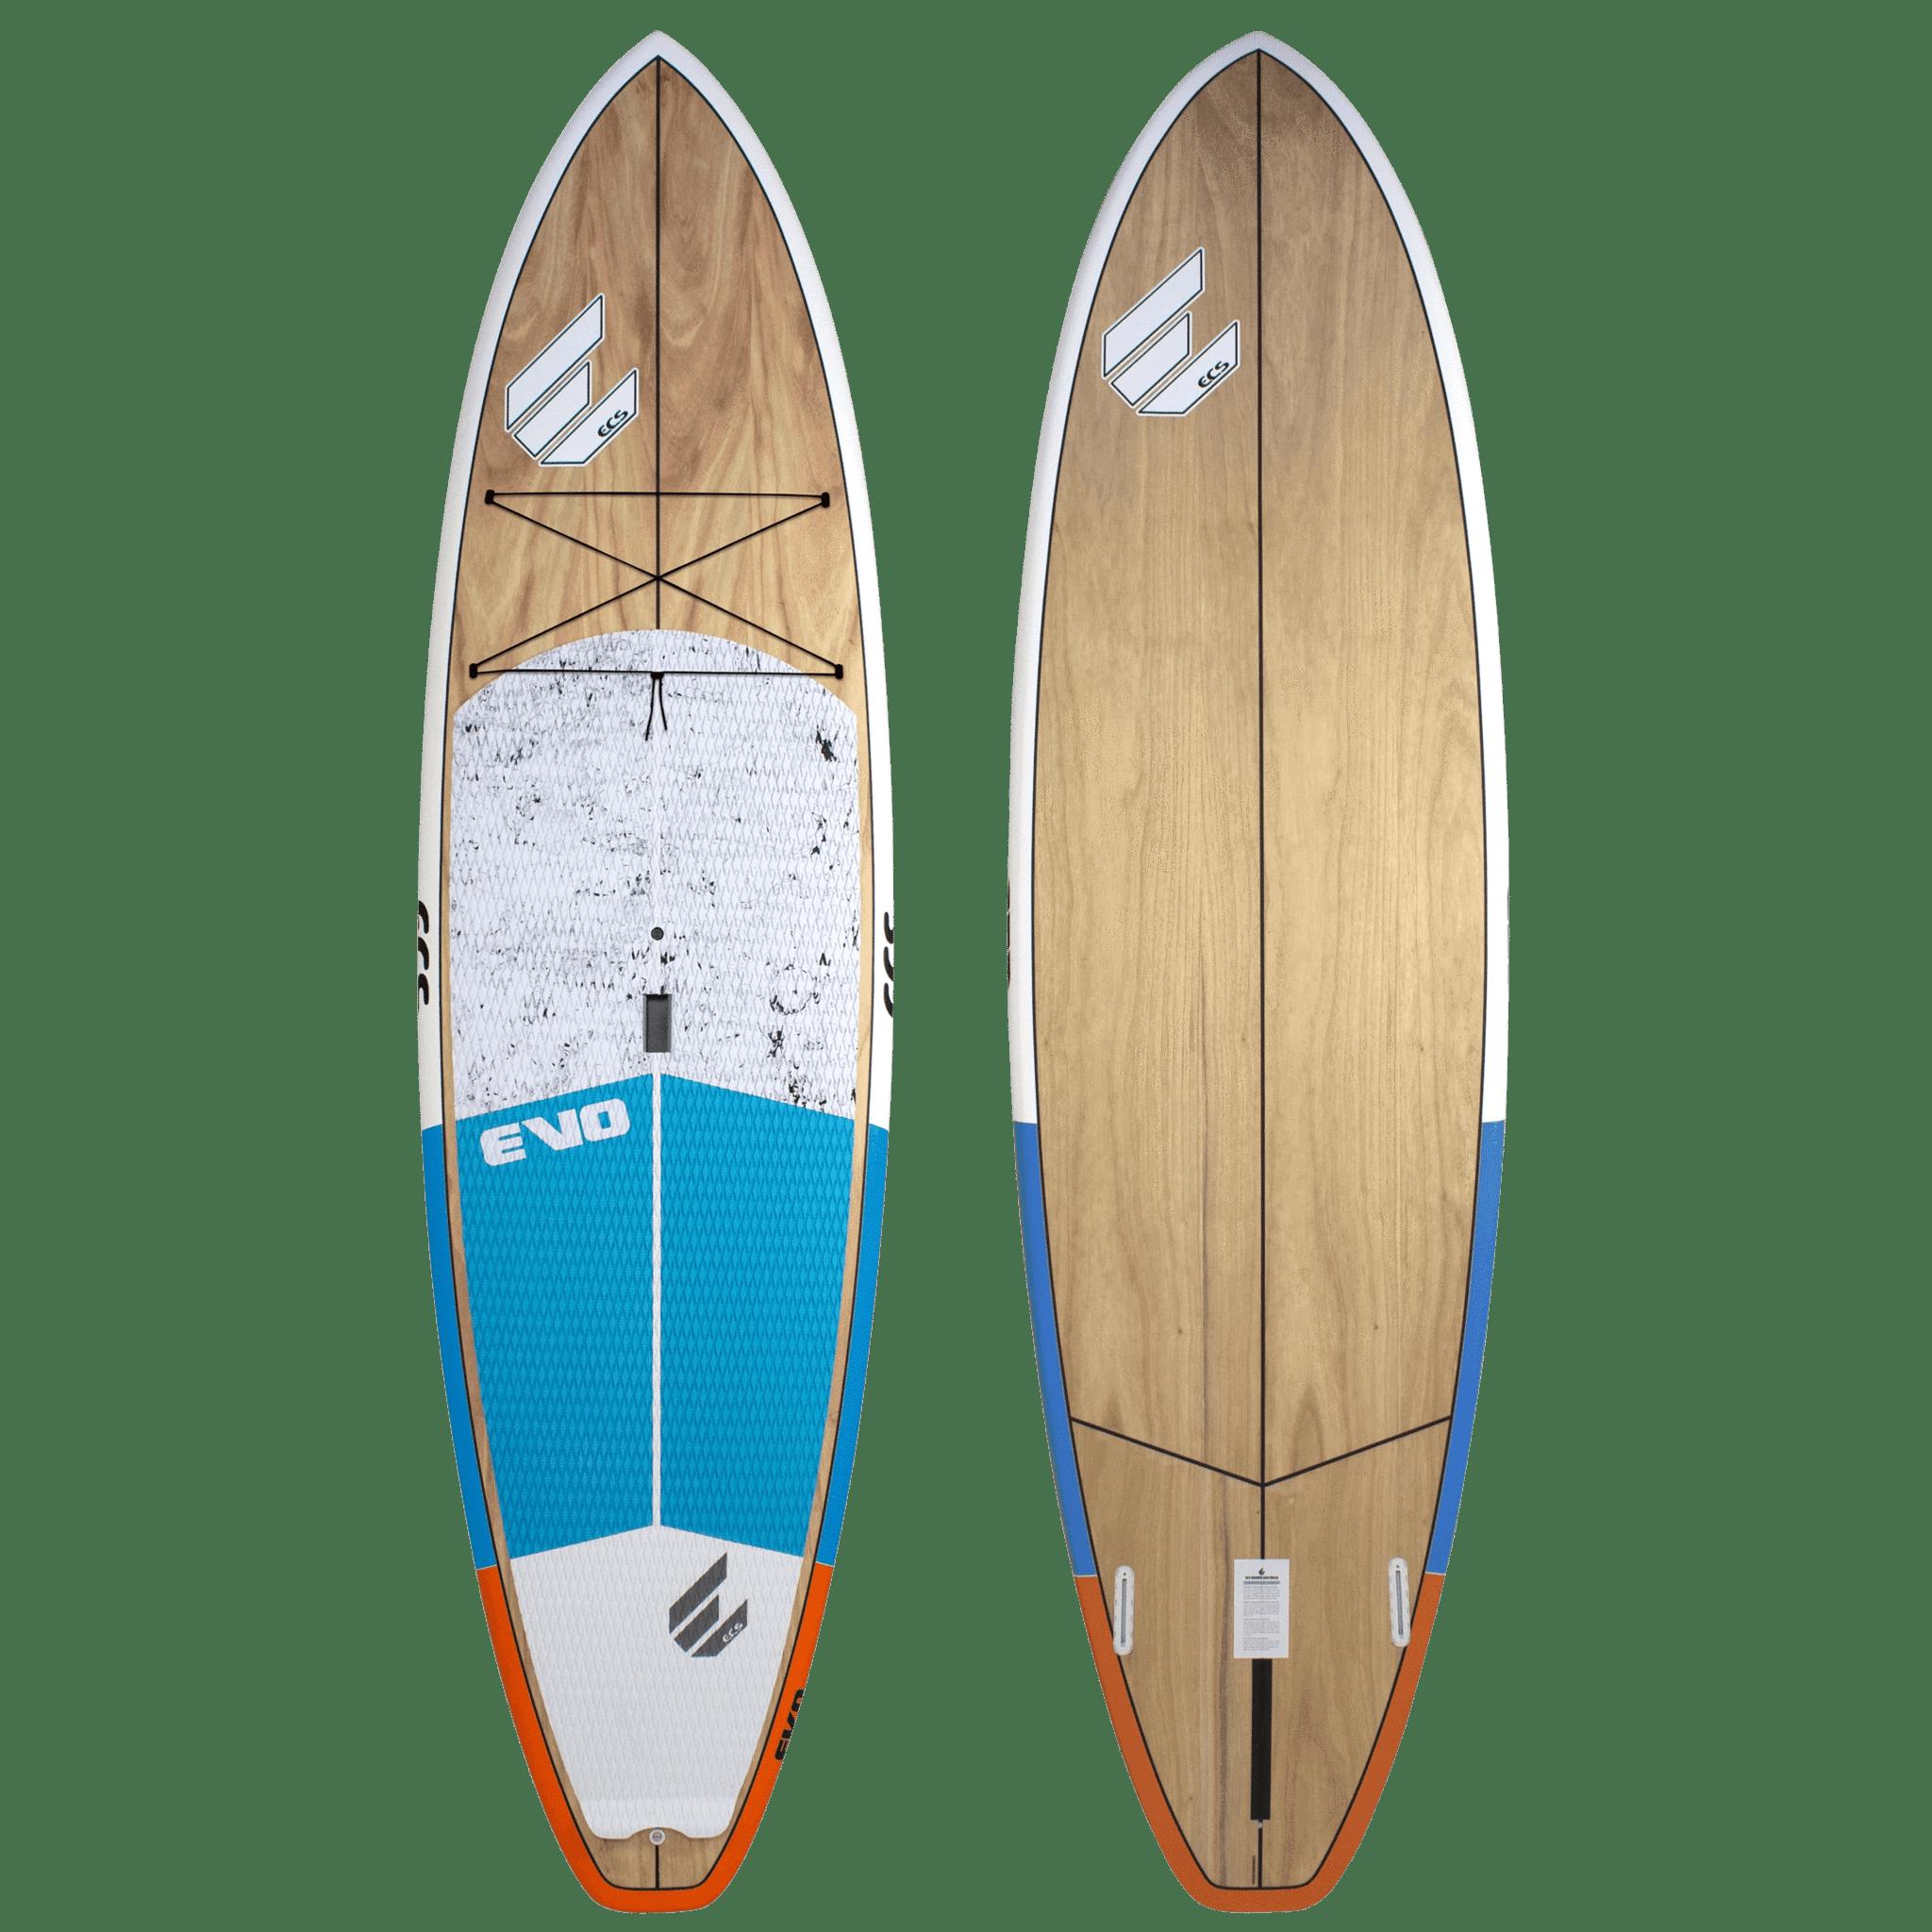 ECS Evo SUP paddle board blue